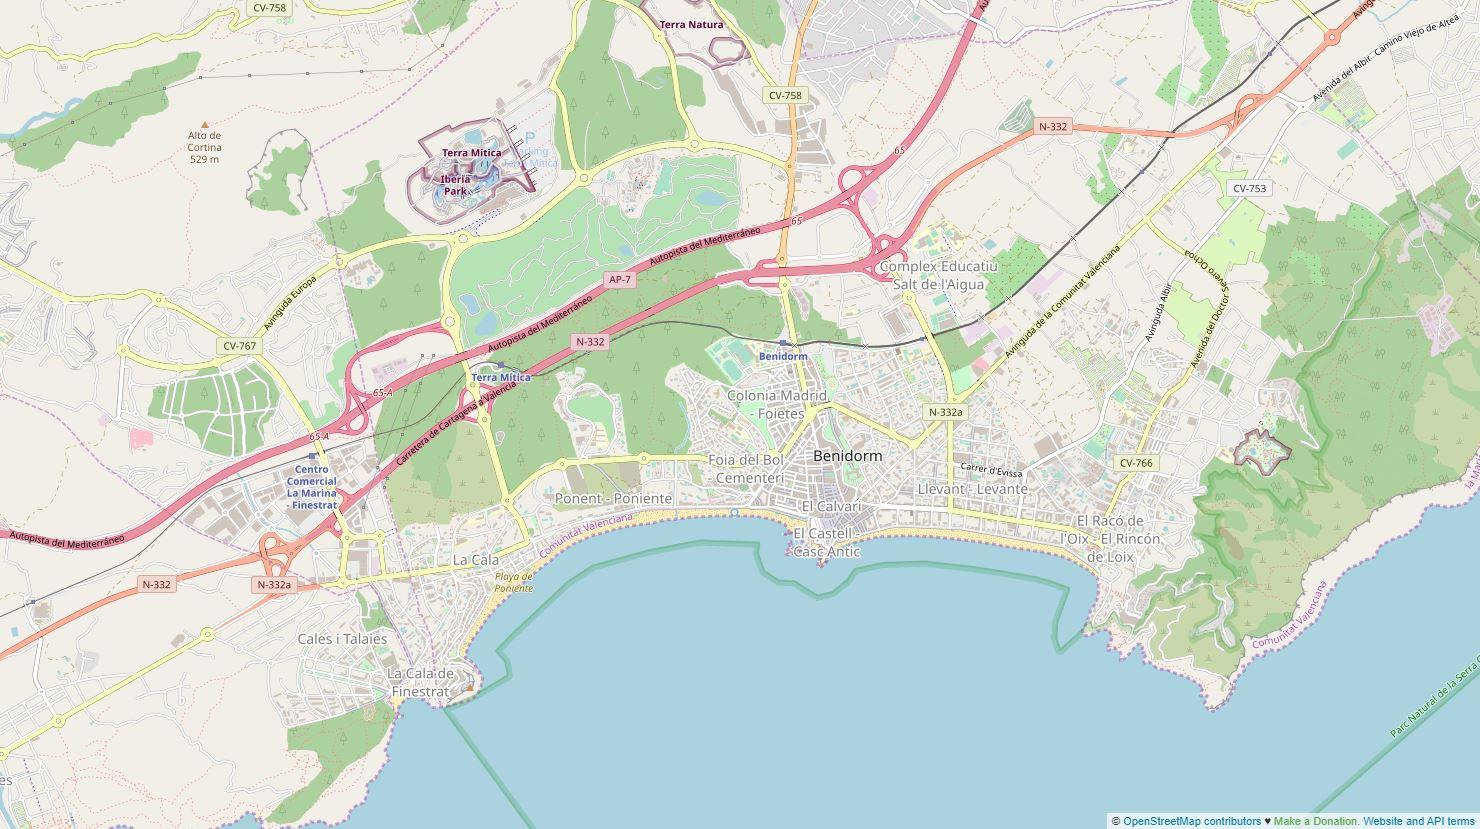 Spend your winter in Benidorm, Spain: Is Benidorm a good snowbird location? 3